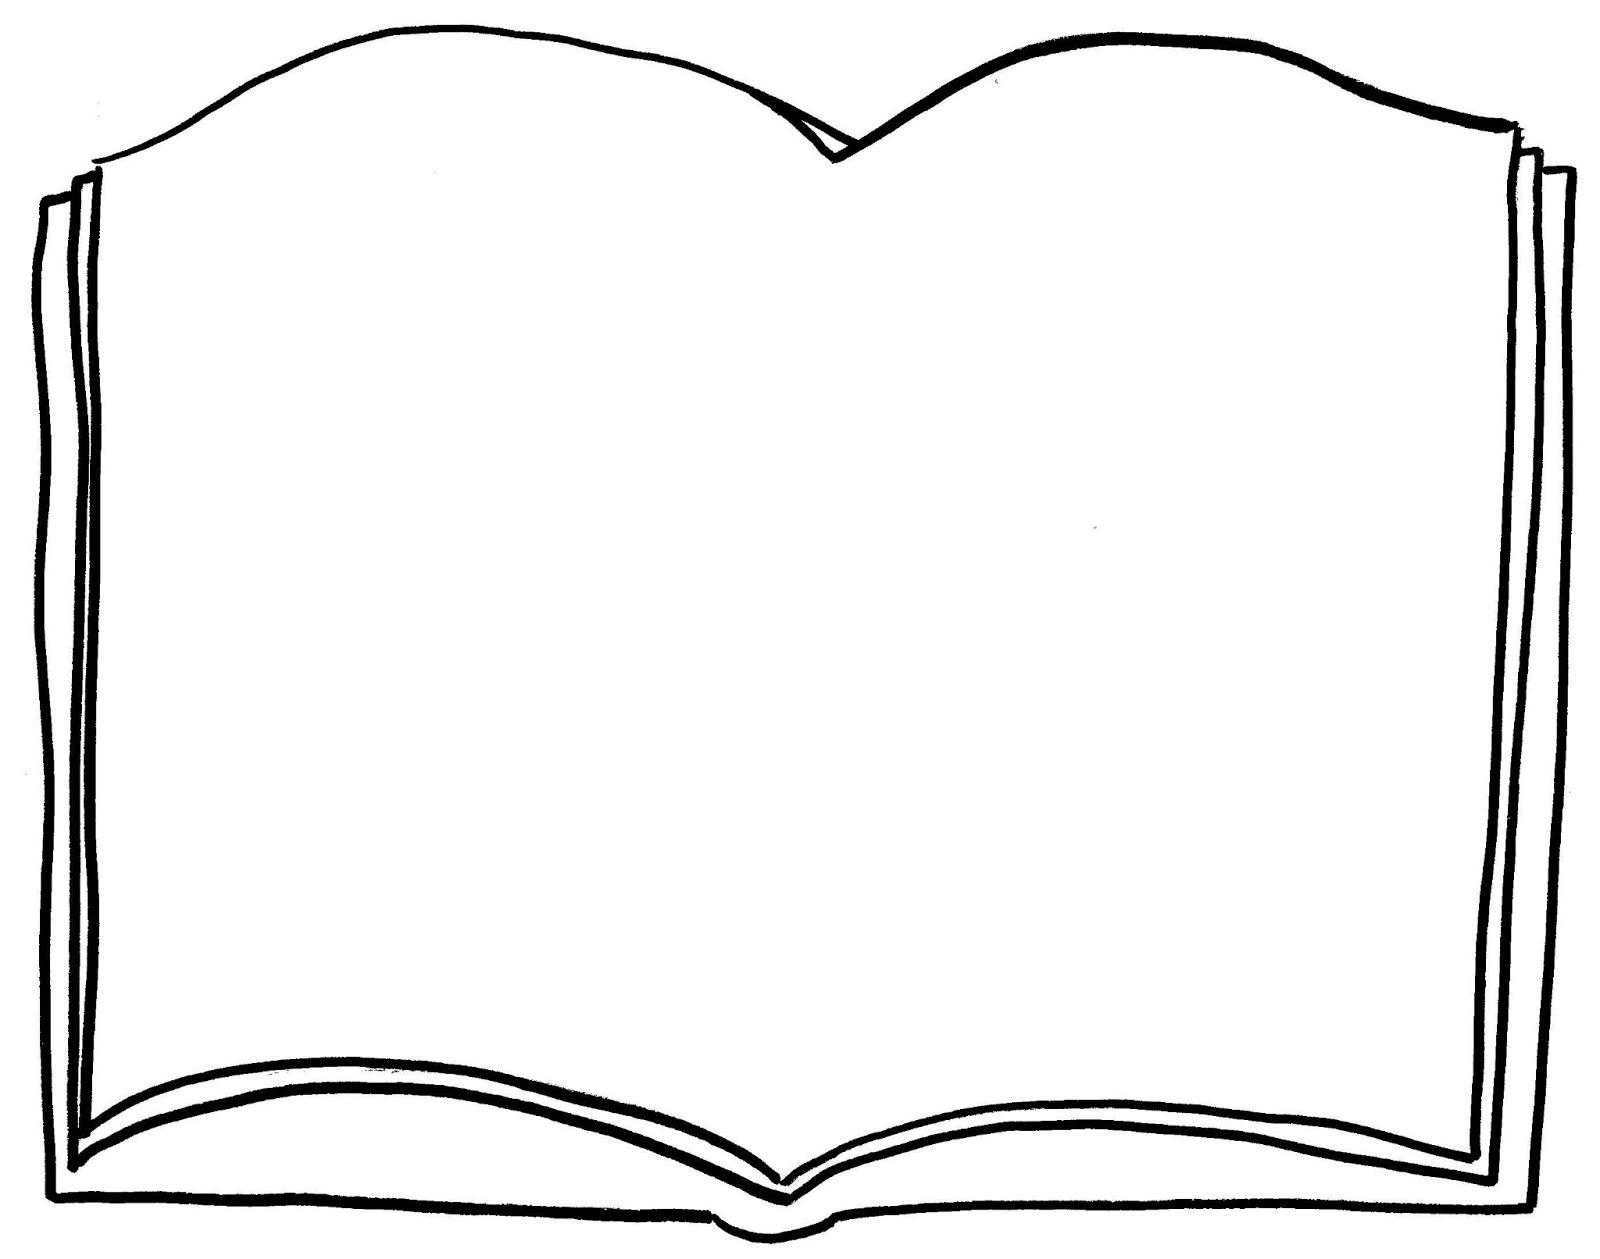 Clip Art Open Book Line Art Cliparts